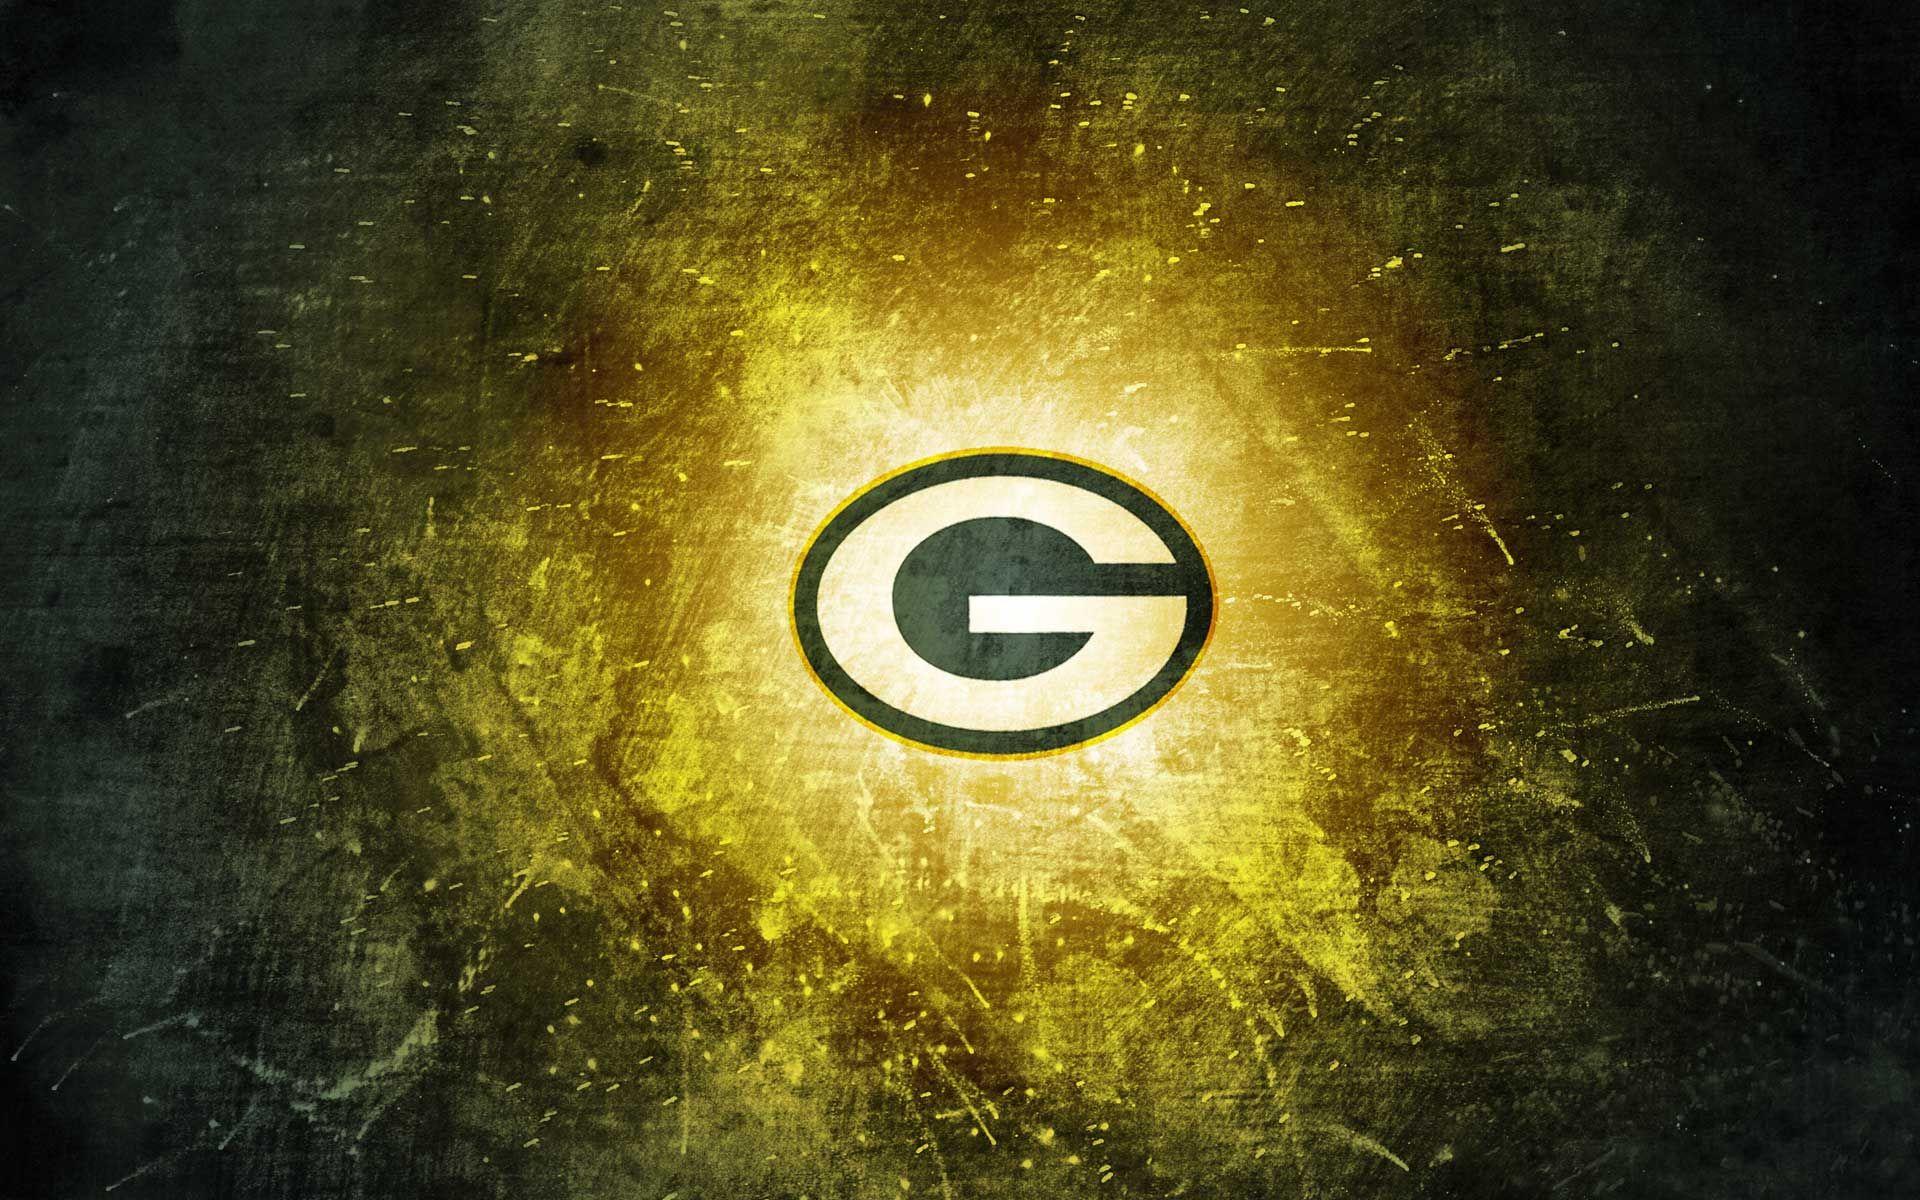 Nfl Green Bay Packers Wallpaper Best Wallpaper Hd Green Bay Packers Logo Green Bay Packers Green Bay Packers Wallpaper